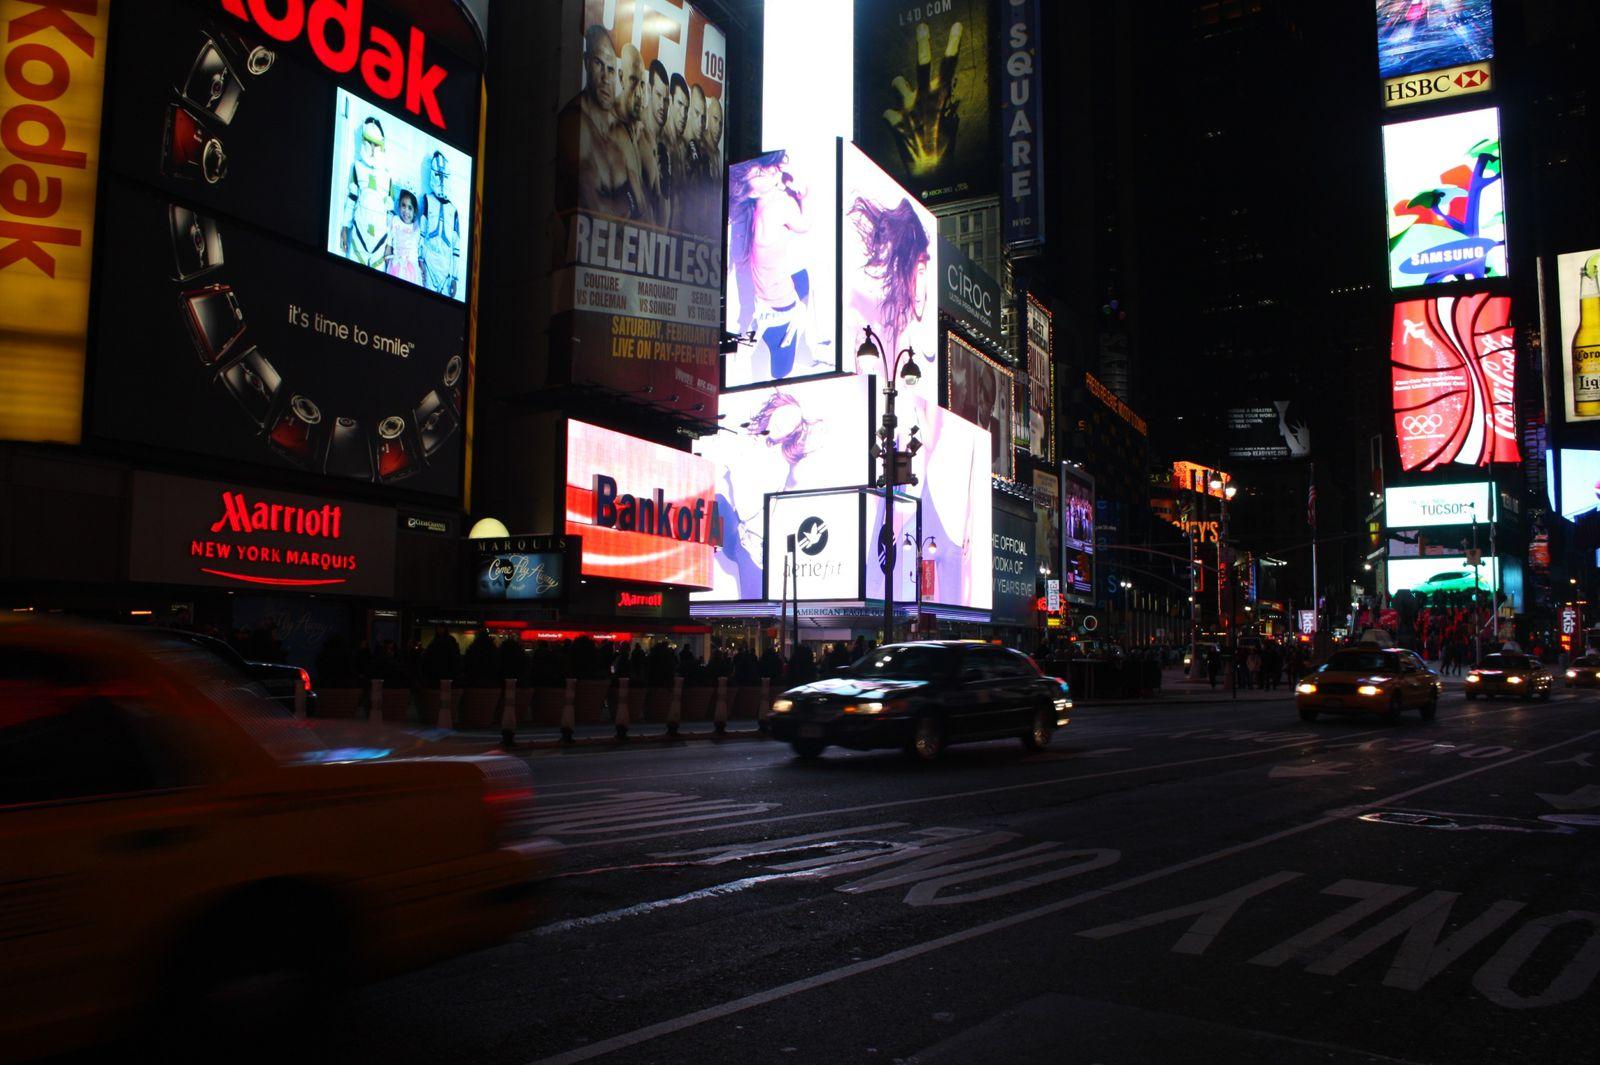 Quand on arrive à New York. Manhattan vu de l'avion.